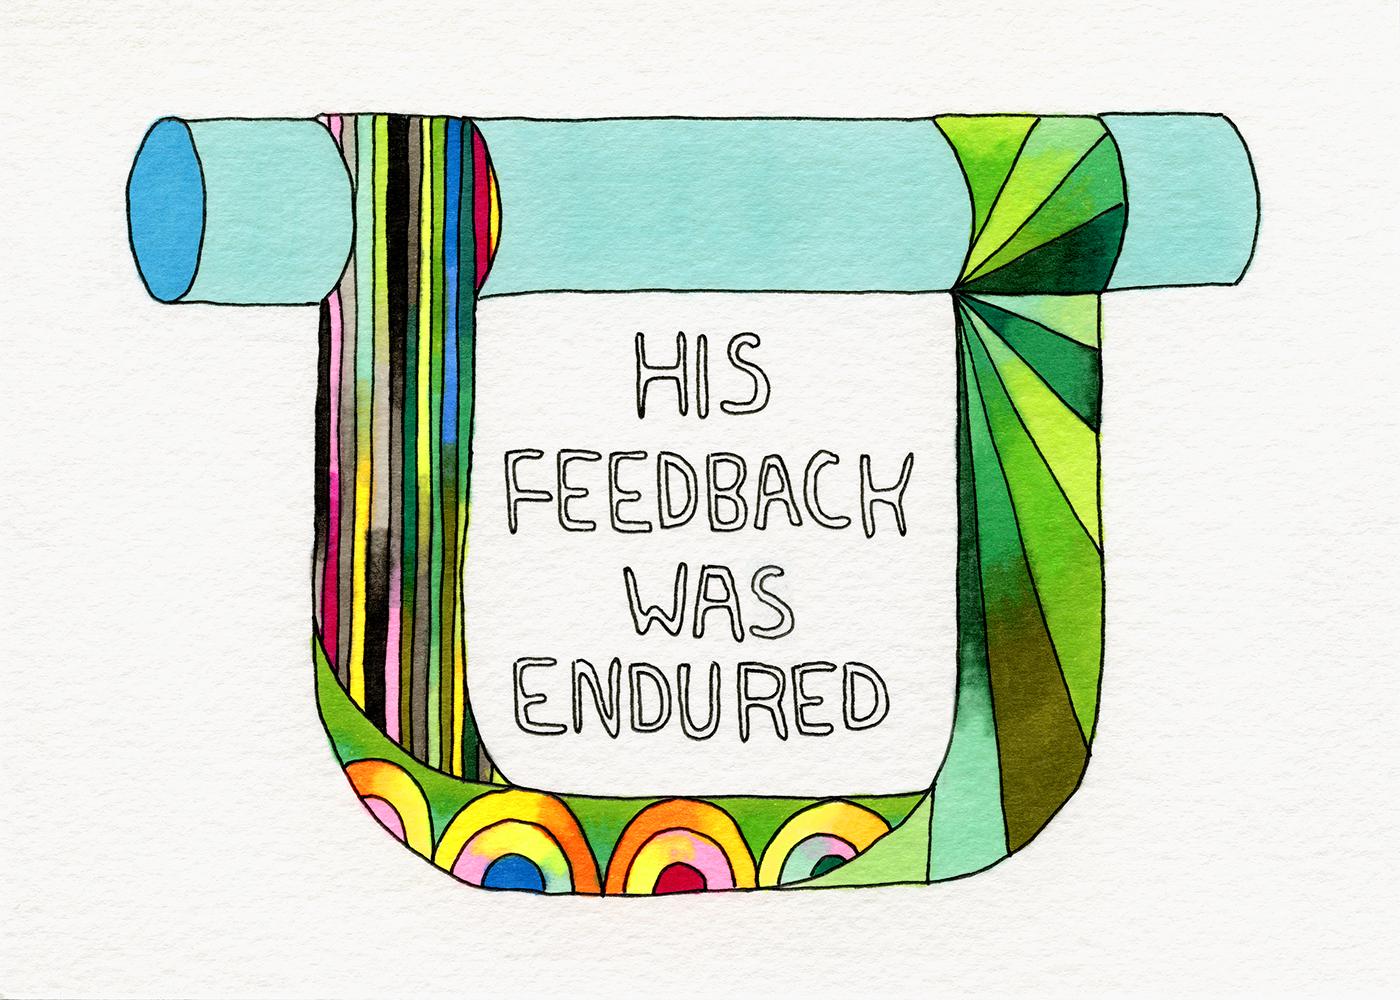 52_his_feedback_was_endured.jpg